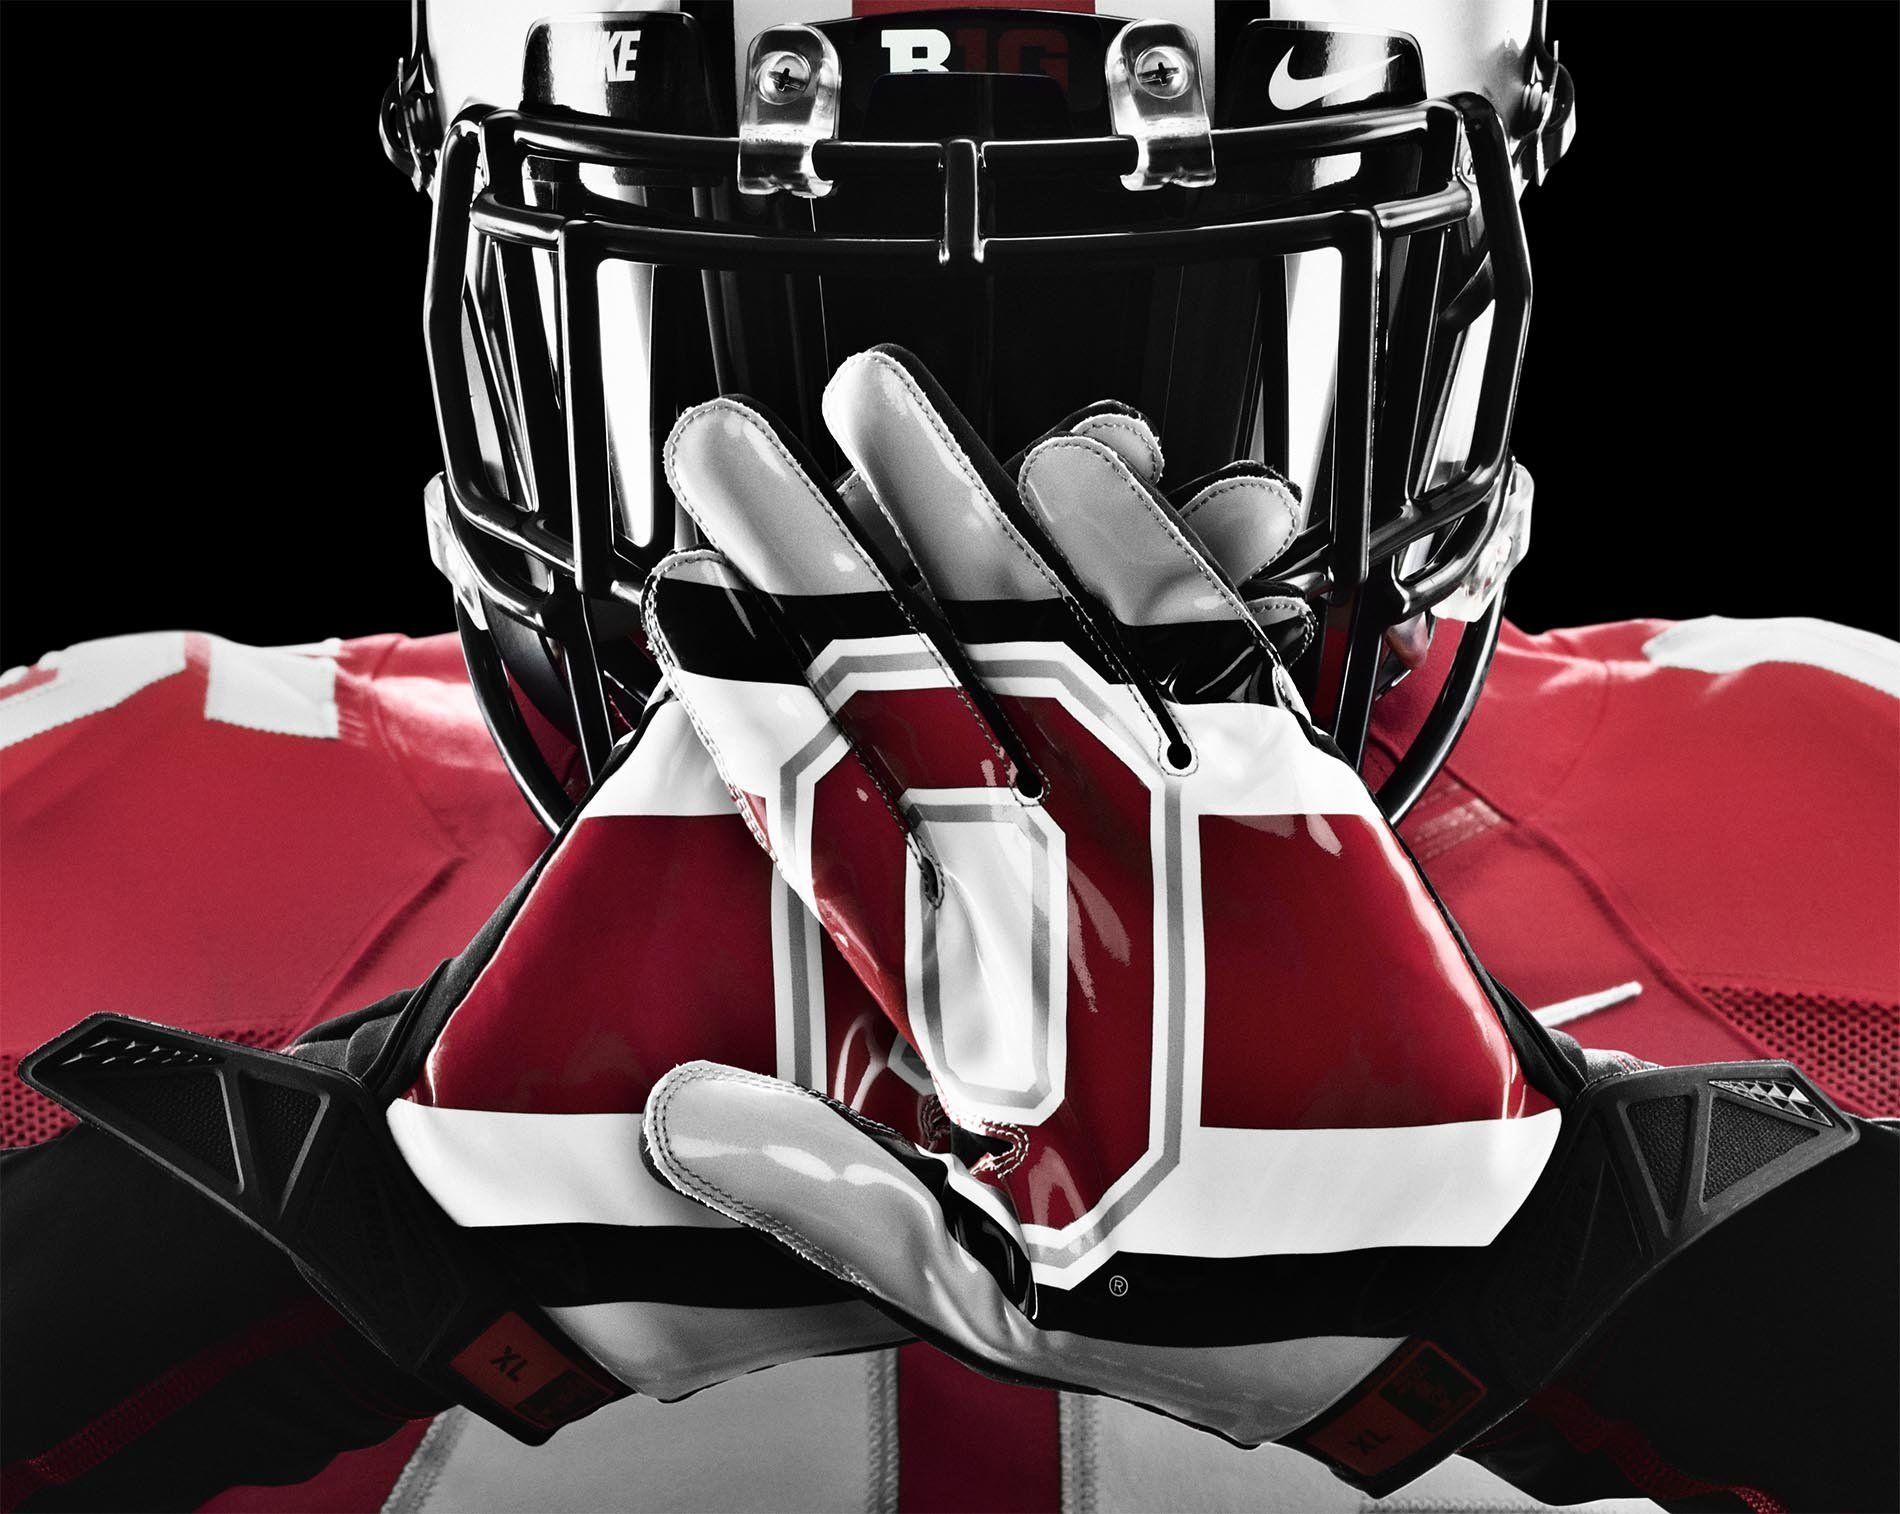 Ohio State Buckeyes College Football Poster Wallpaper 1900x1514 592664 Ohio State Buckeyes Poster Ohio State Buckeyes Football Ohio